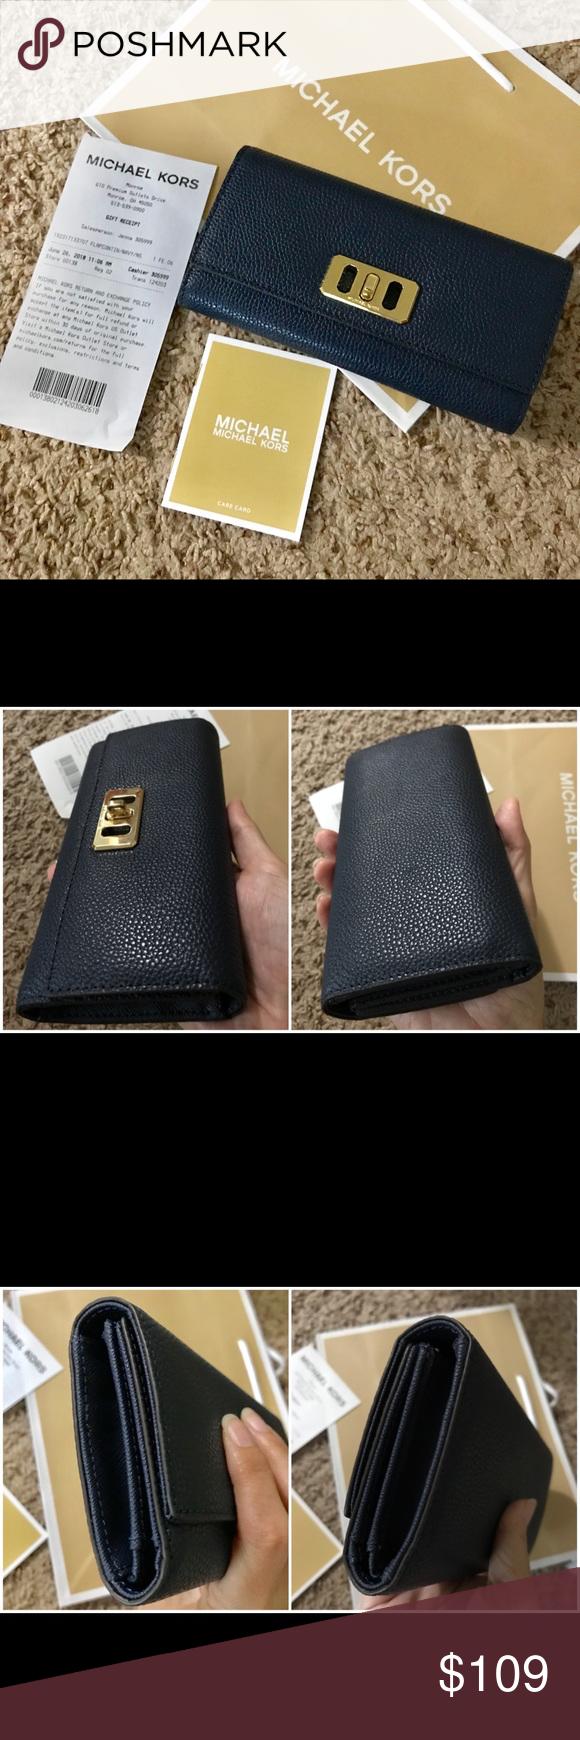 92a5bd7313c4 MICHAEL KORS Karson Flap Continent. Leather Wallet Details: - Color Navy - Trifold  Wallet